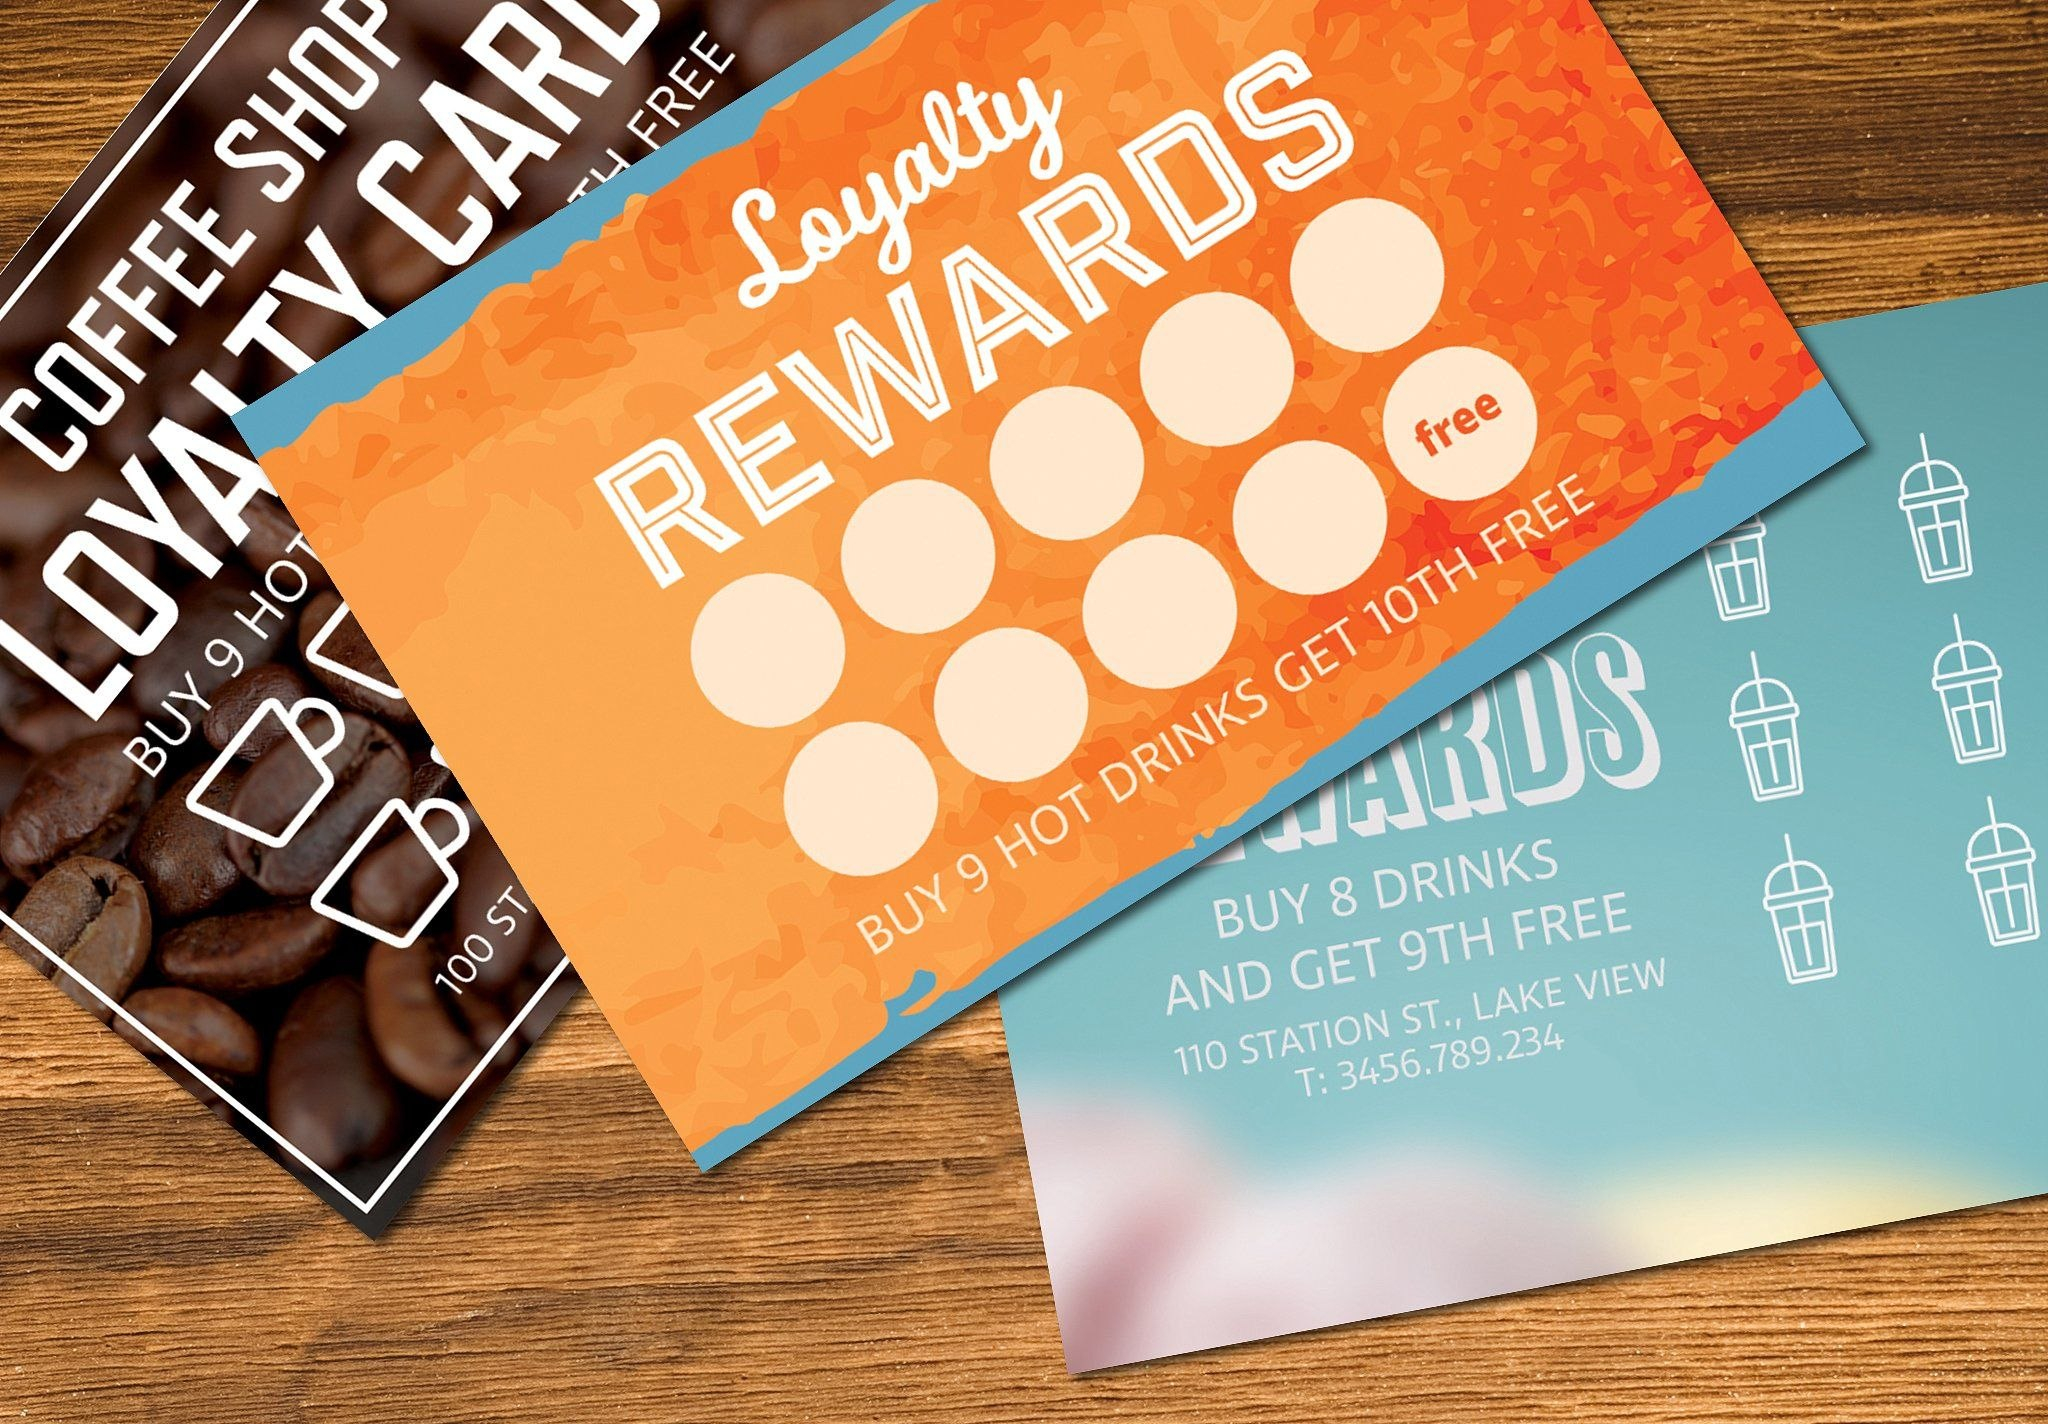 Loyalty Card Templates Mockup Organisedtextimageeasy  Home Regarding Loyalty Card Design Template